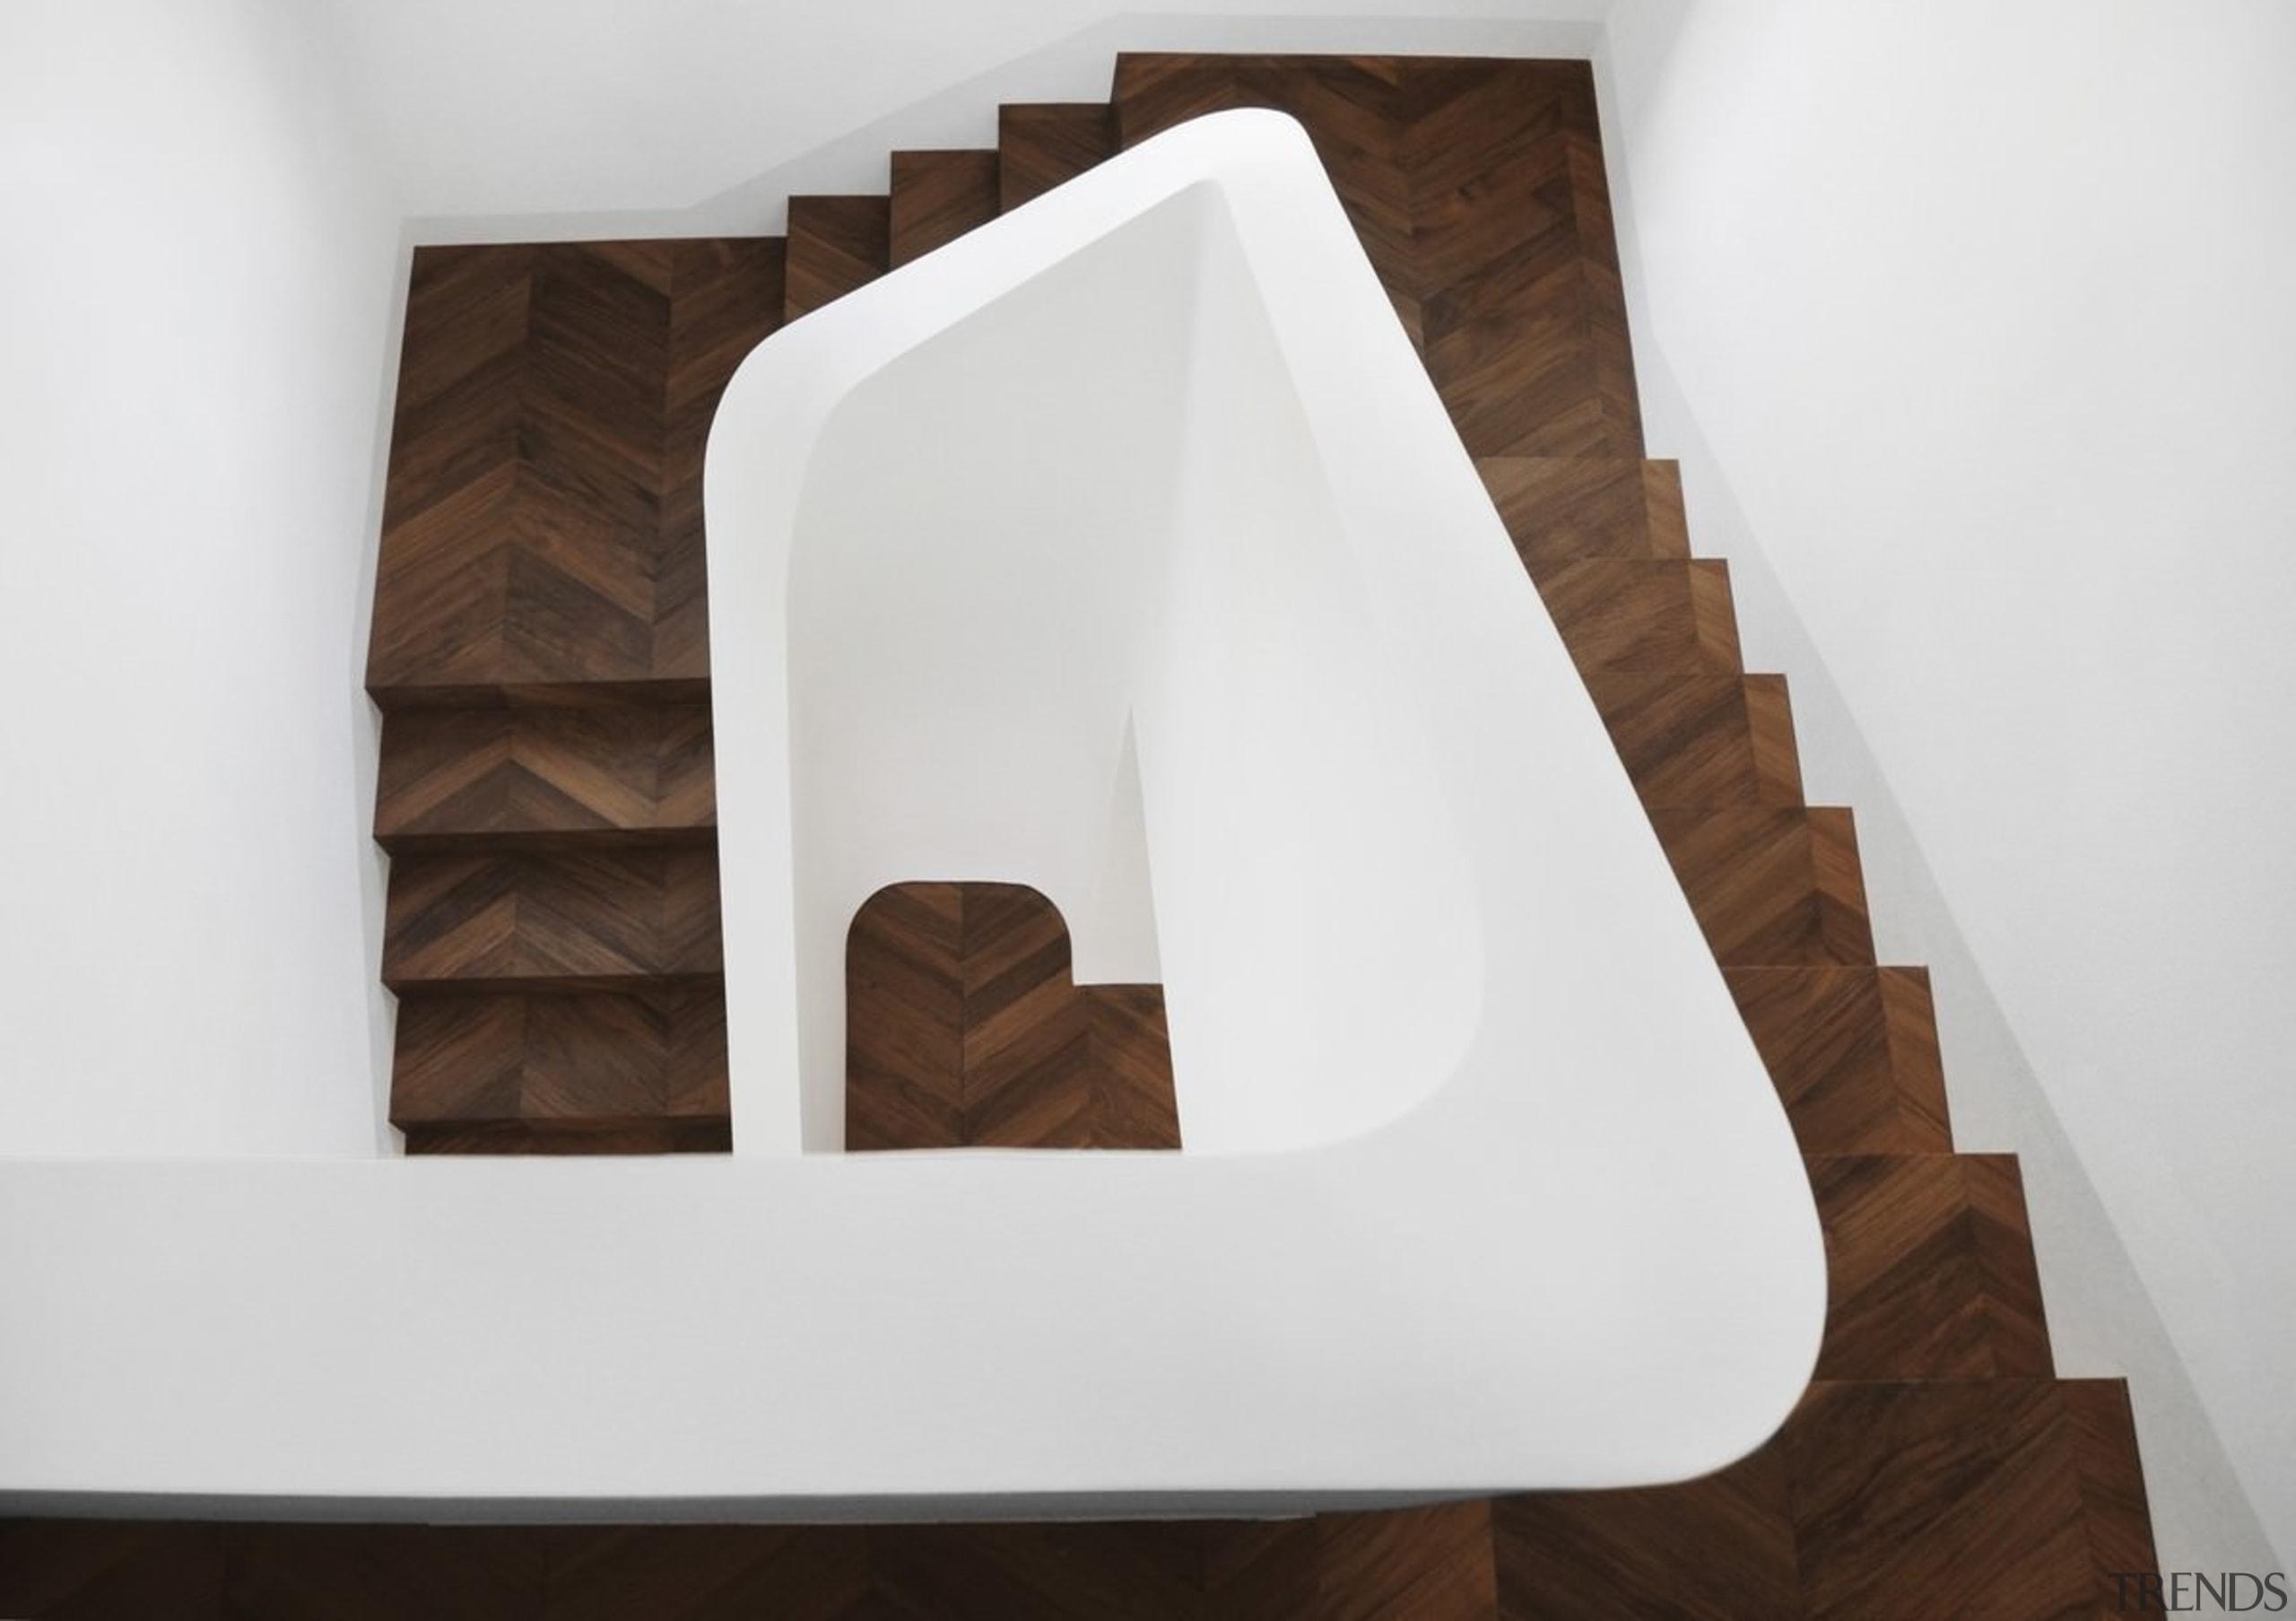 Architect: Tisselli Studio ArchitettiPhotography by Filippo Tisselli furniture, product design, white